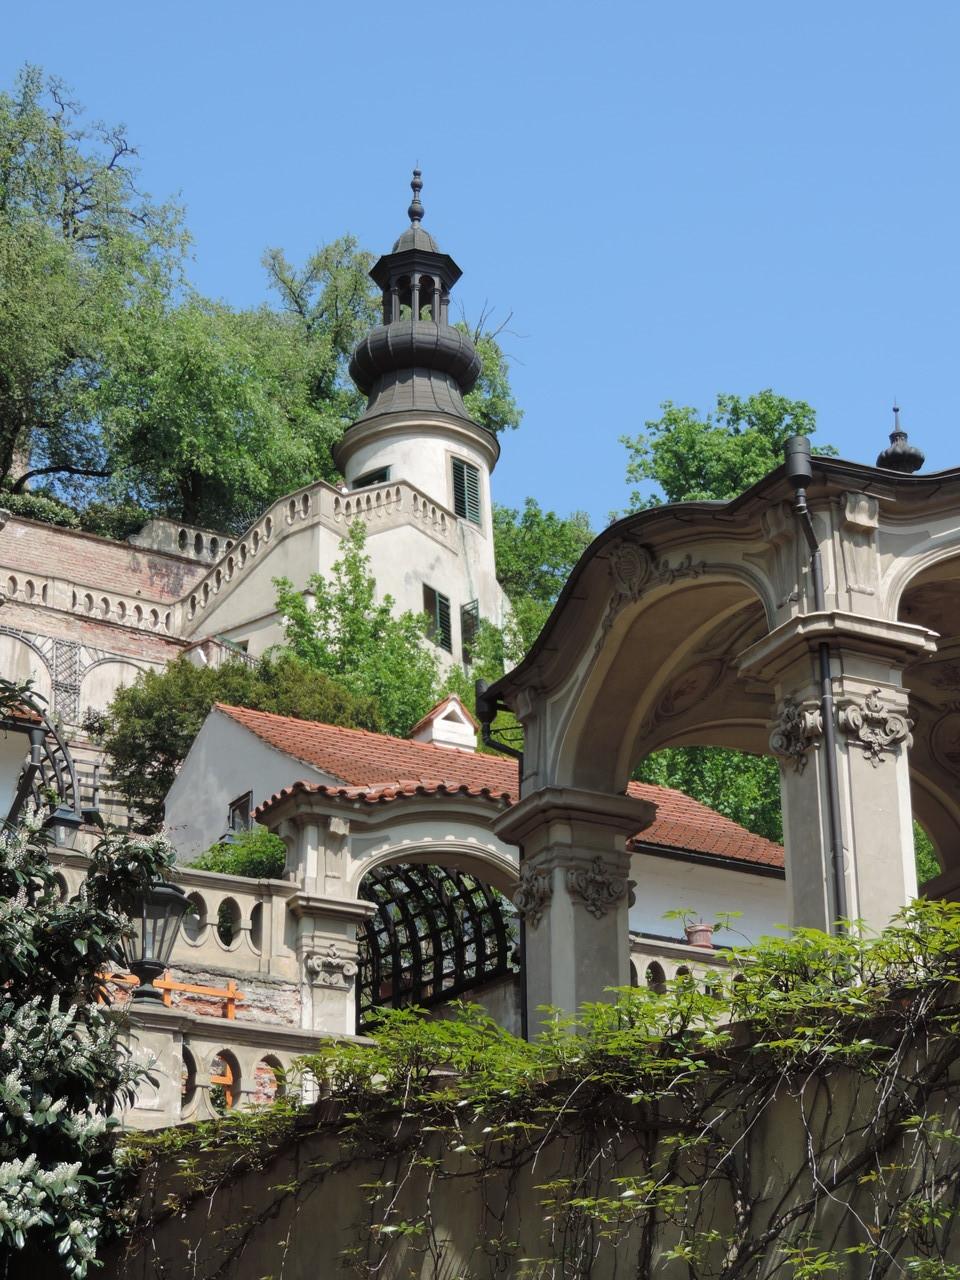 Ledebour Gärten